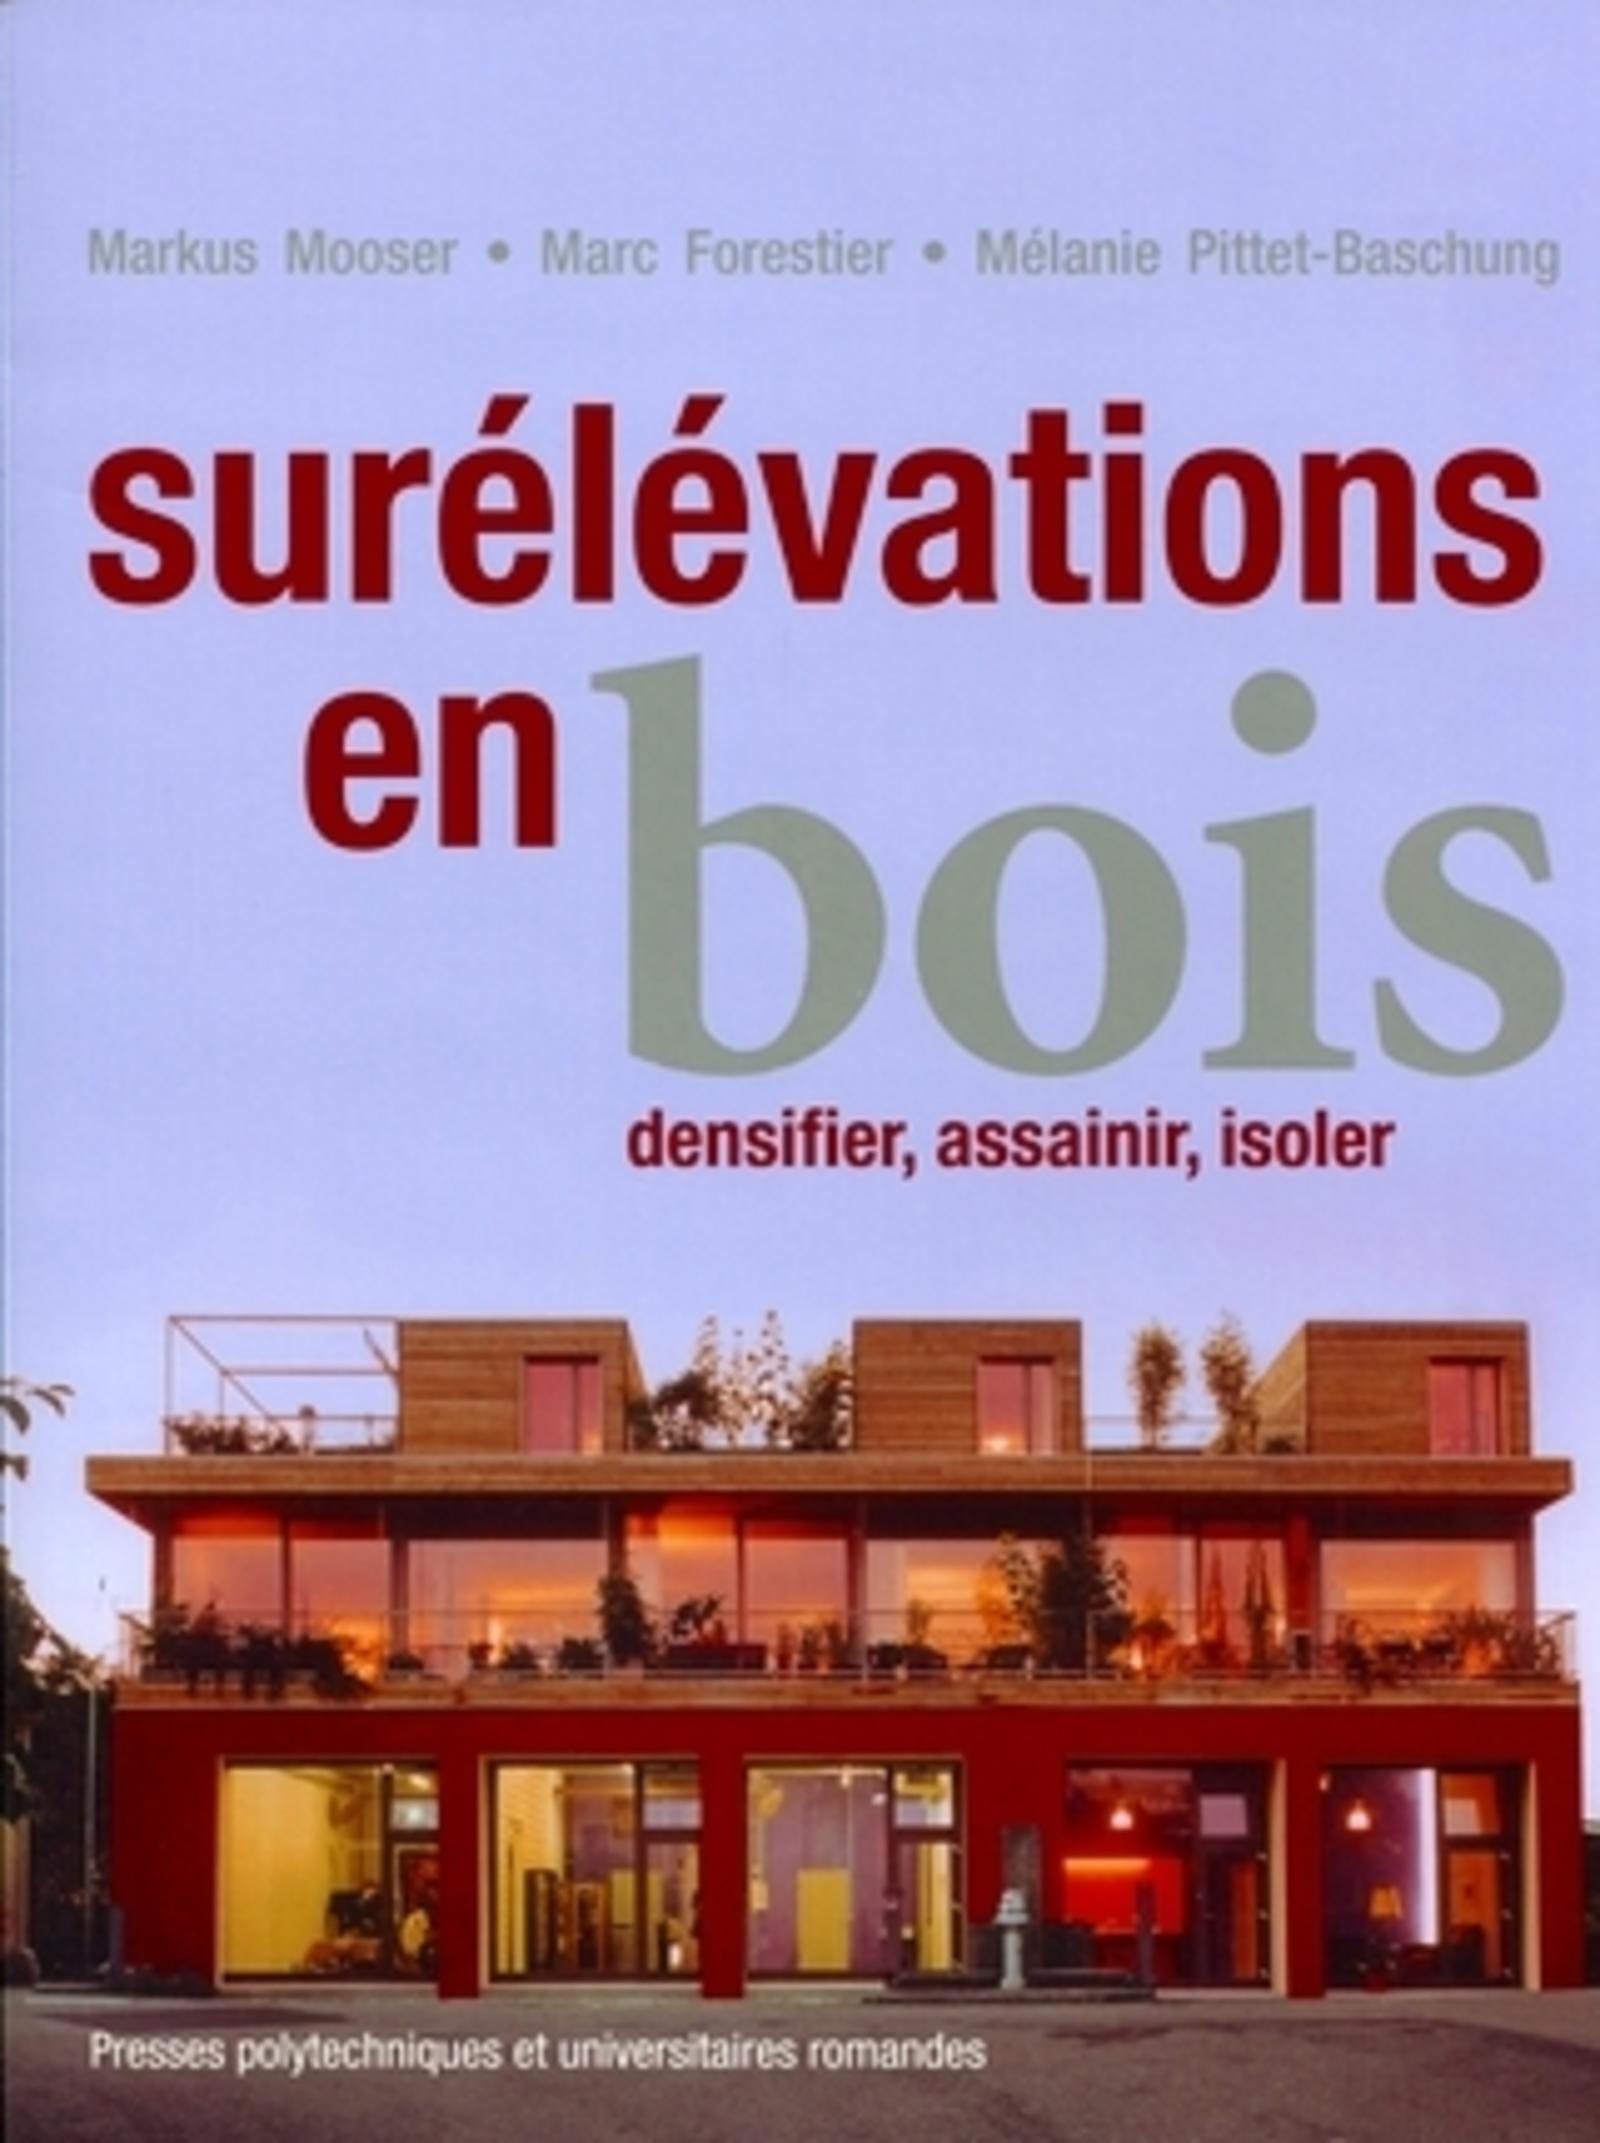 SURELEVATIONS EN BOIS - DENSIFIER, ASSAINIR, ISOLER.